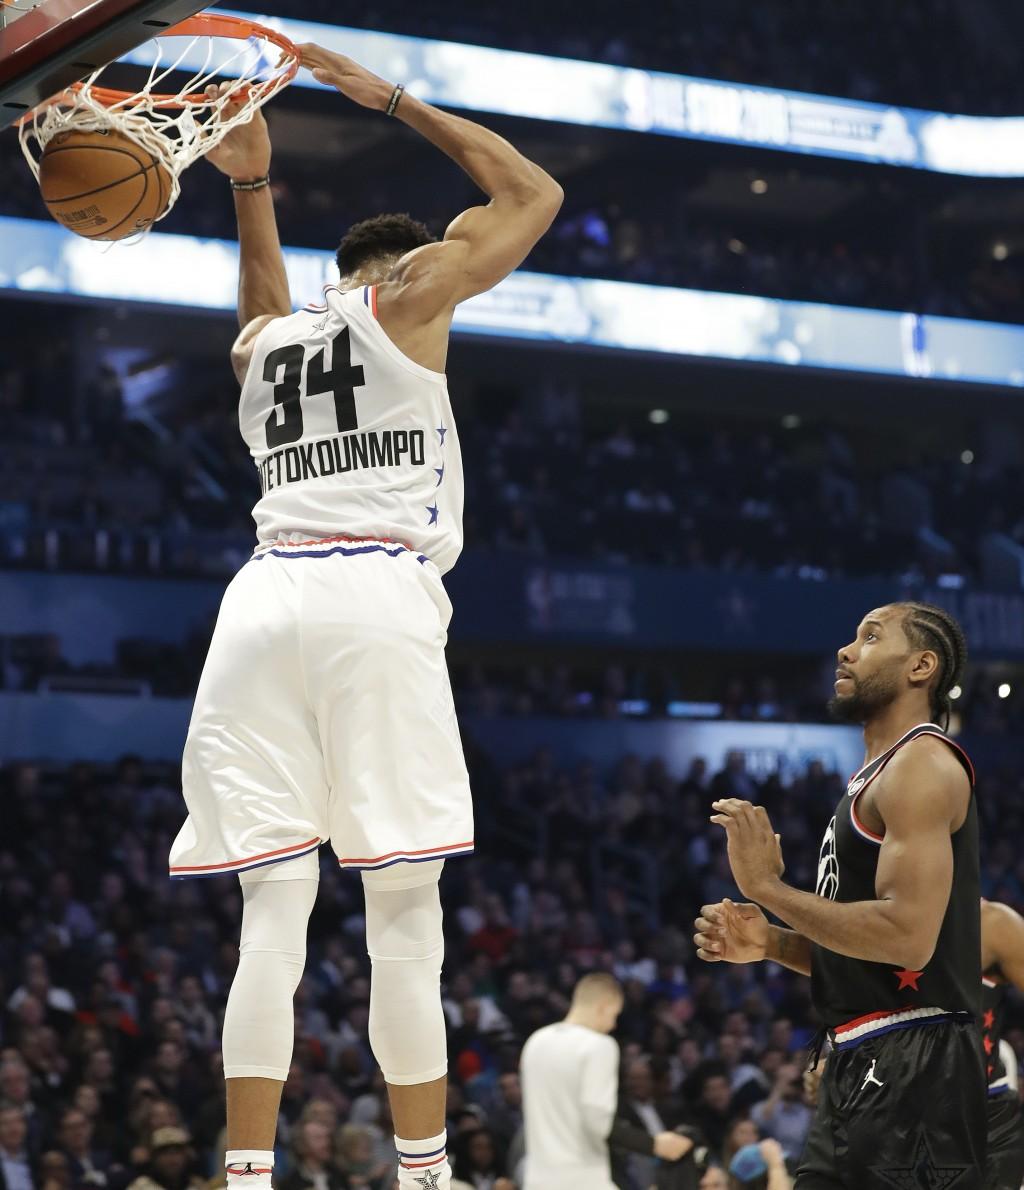 Team Giannis' Giannis Antetokounmpo, of the Milwaukee Bucks, dunks the ball against Team LeBron during the first half of an NBA All-Star basketball ga